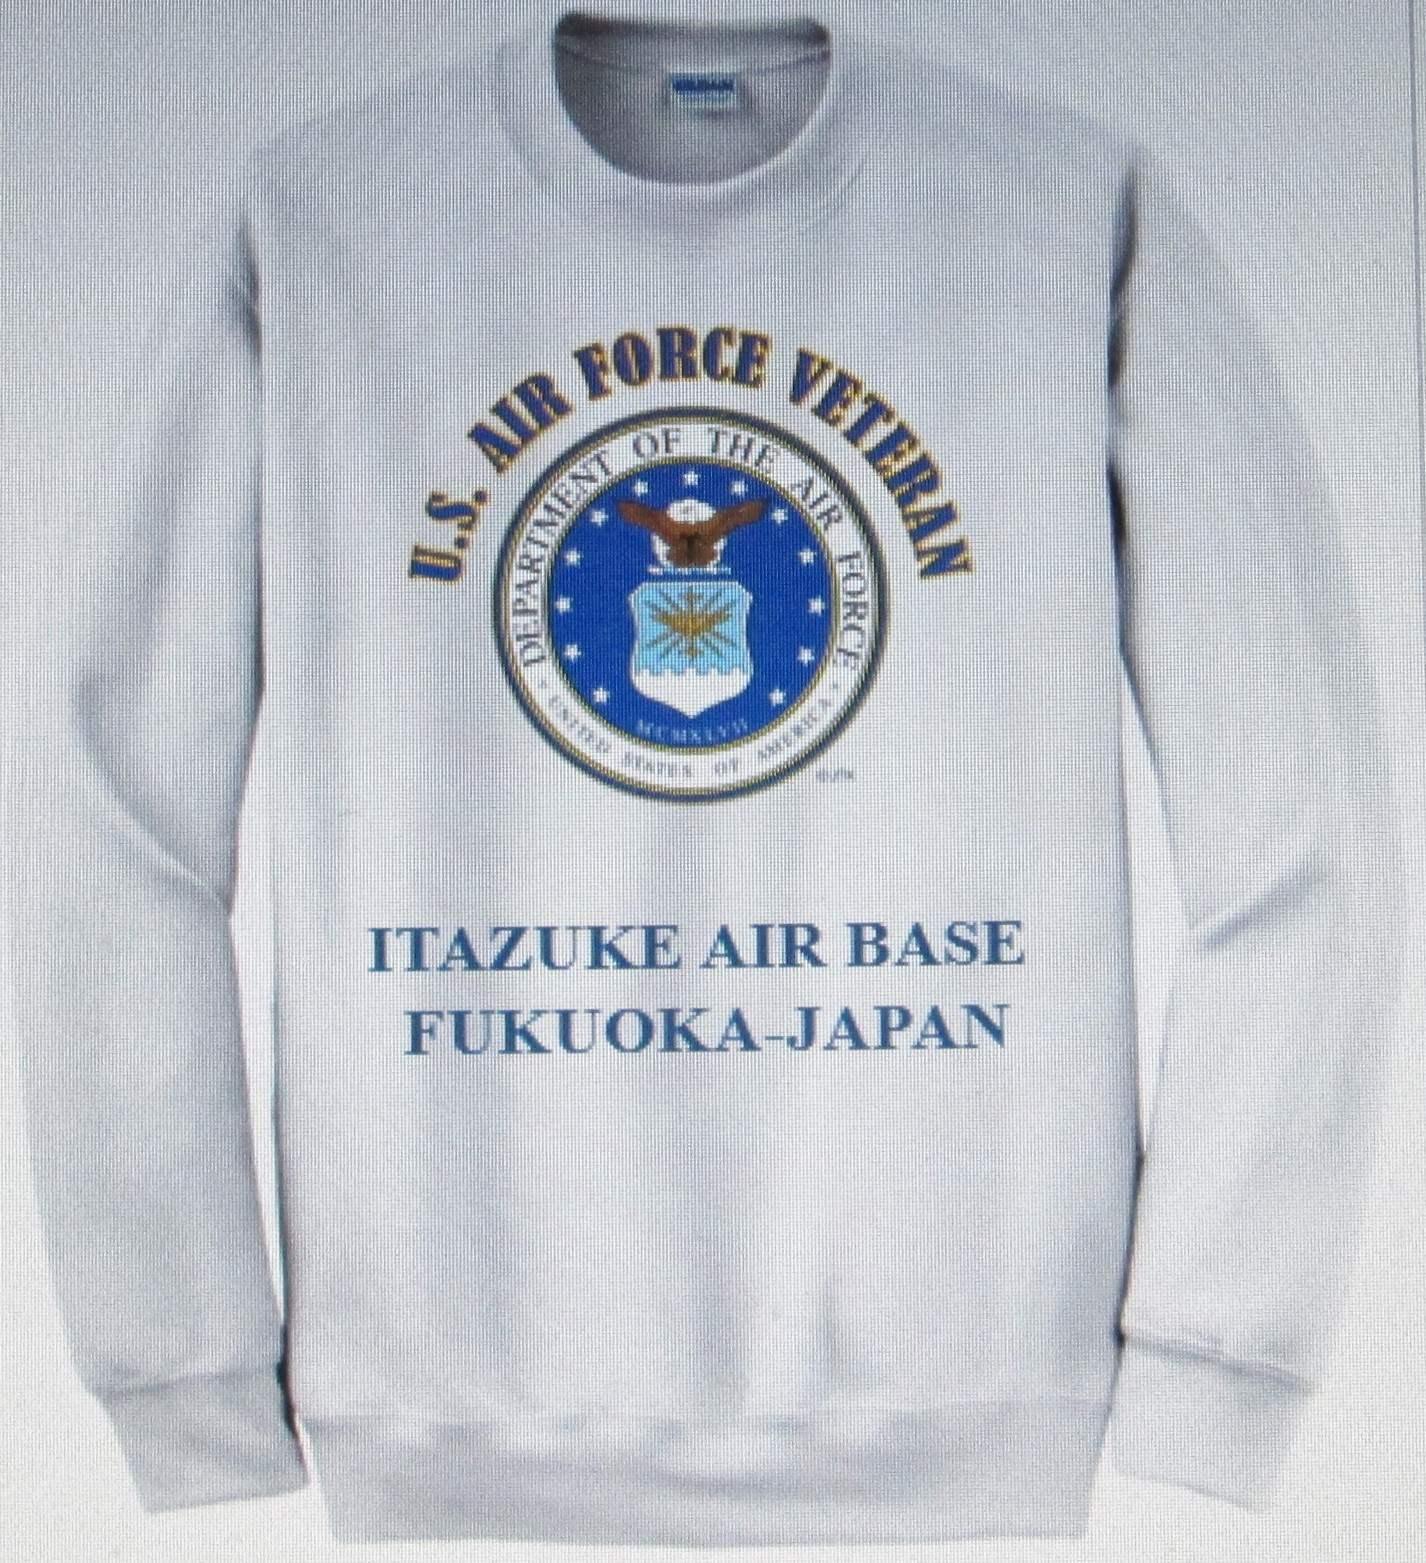 ITAZUKE AIR BASE  FUKUOKA-JAPAN  AIR FORCE EMBLEM VETERAN SWEATSHIRT